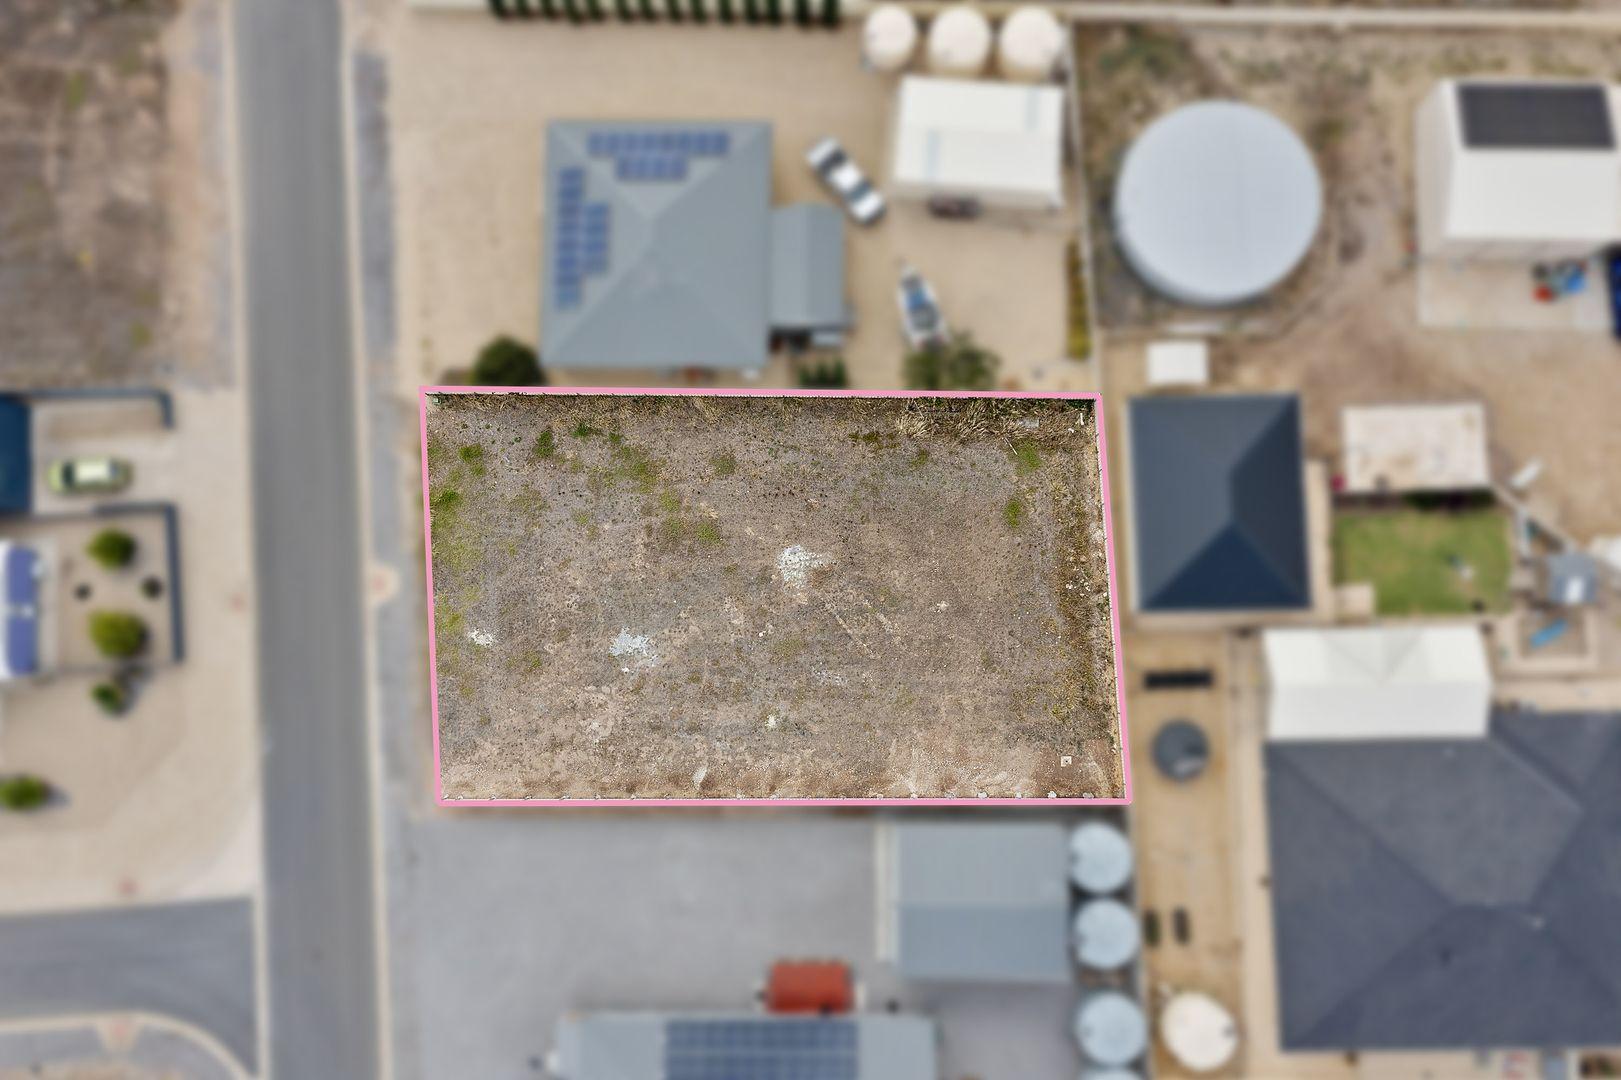 54/39 Captain Hutchinson Drive, Point Turton SA 5575, Image 1